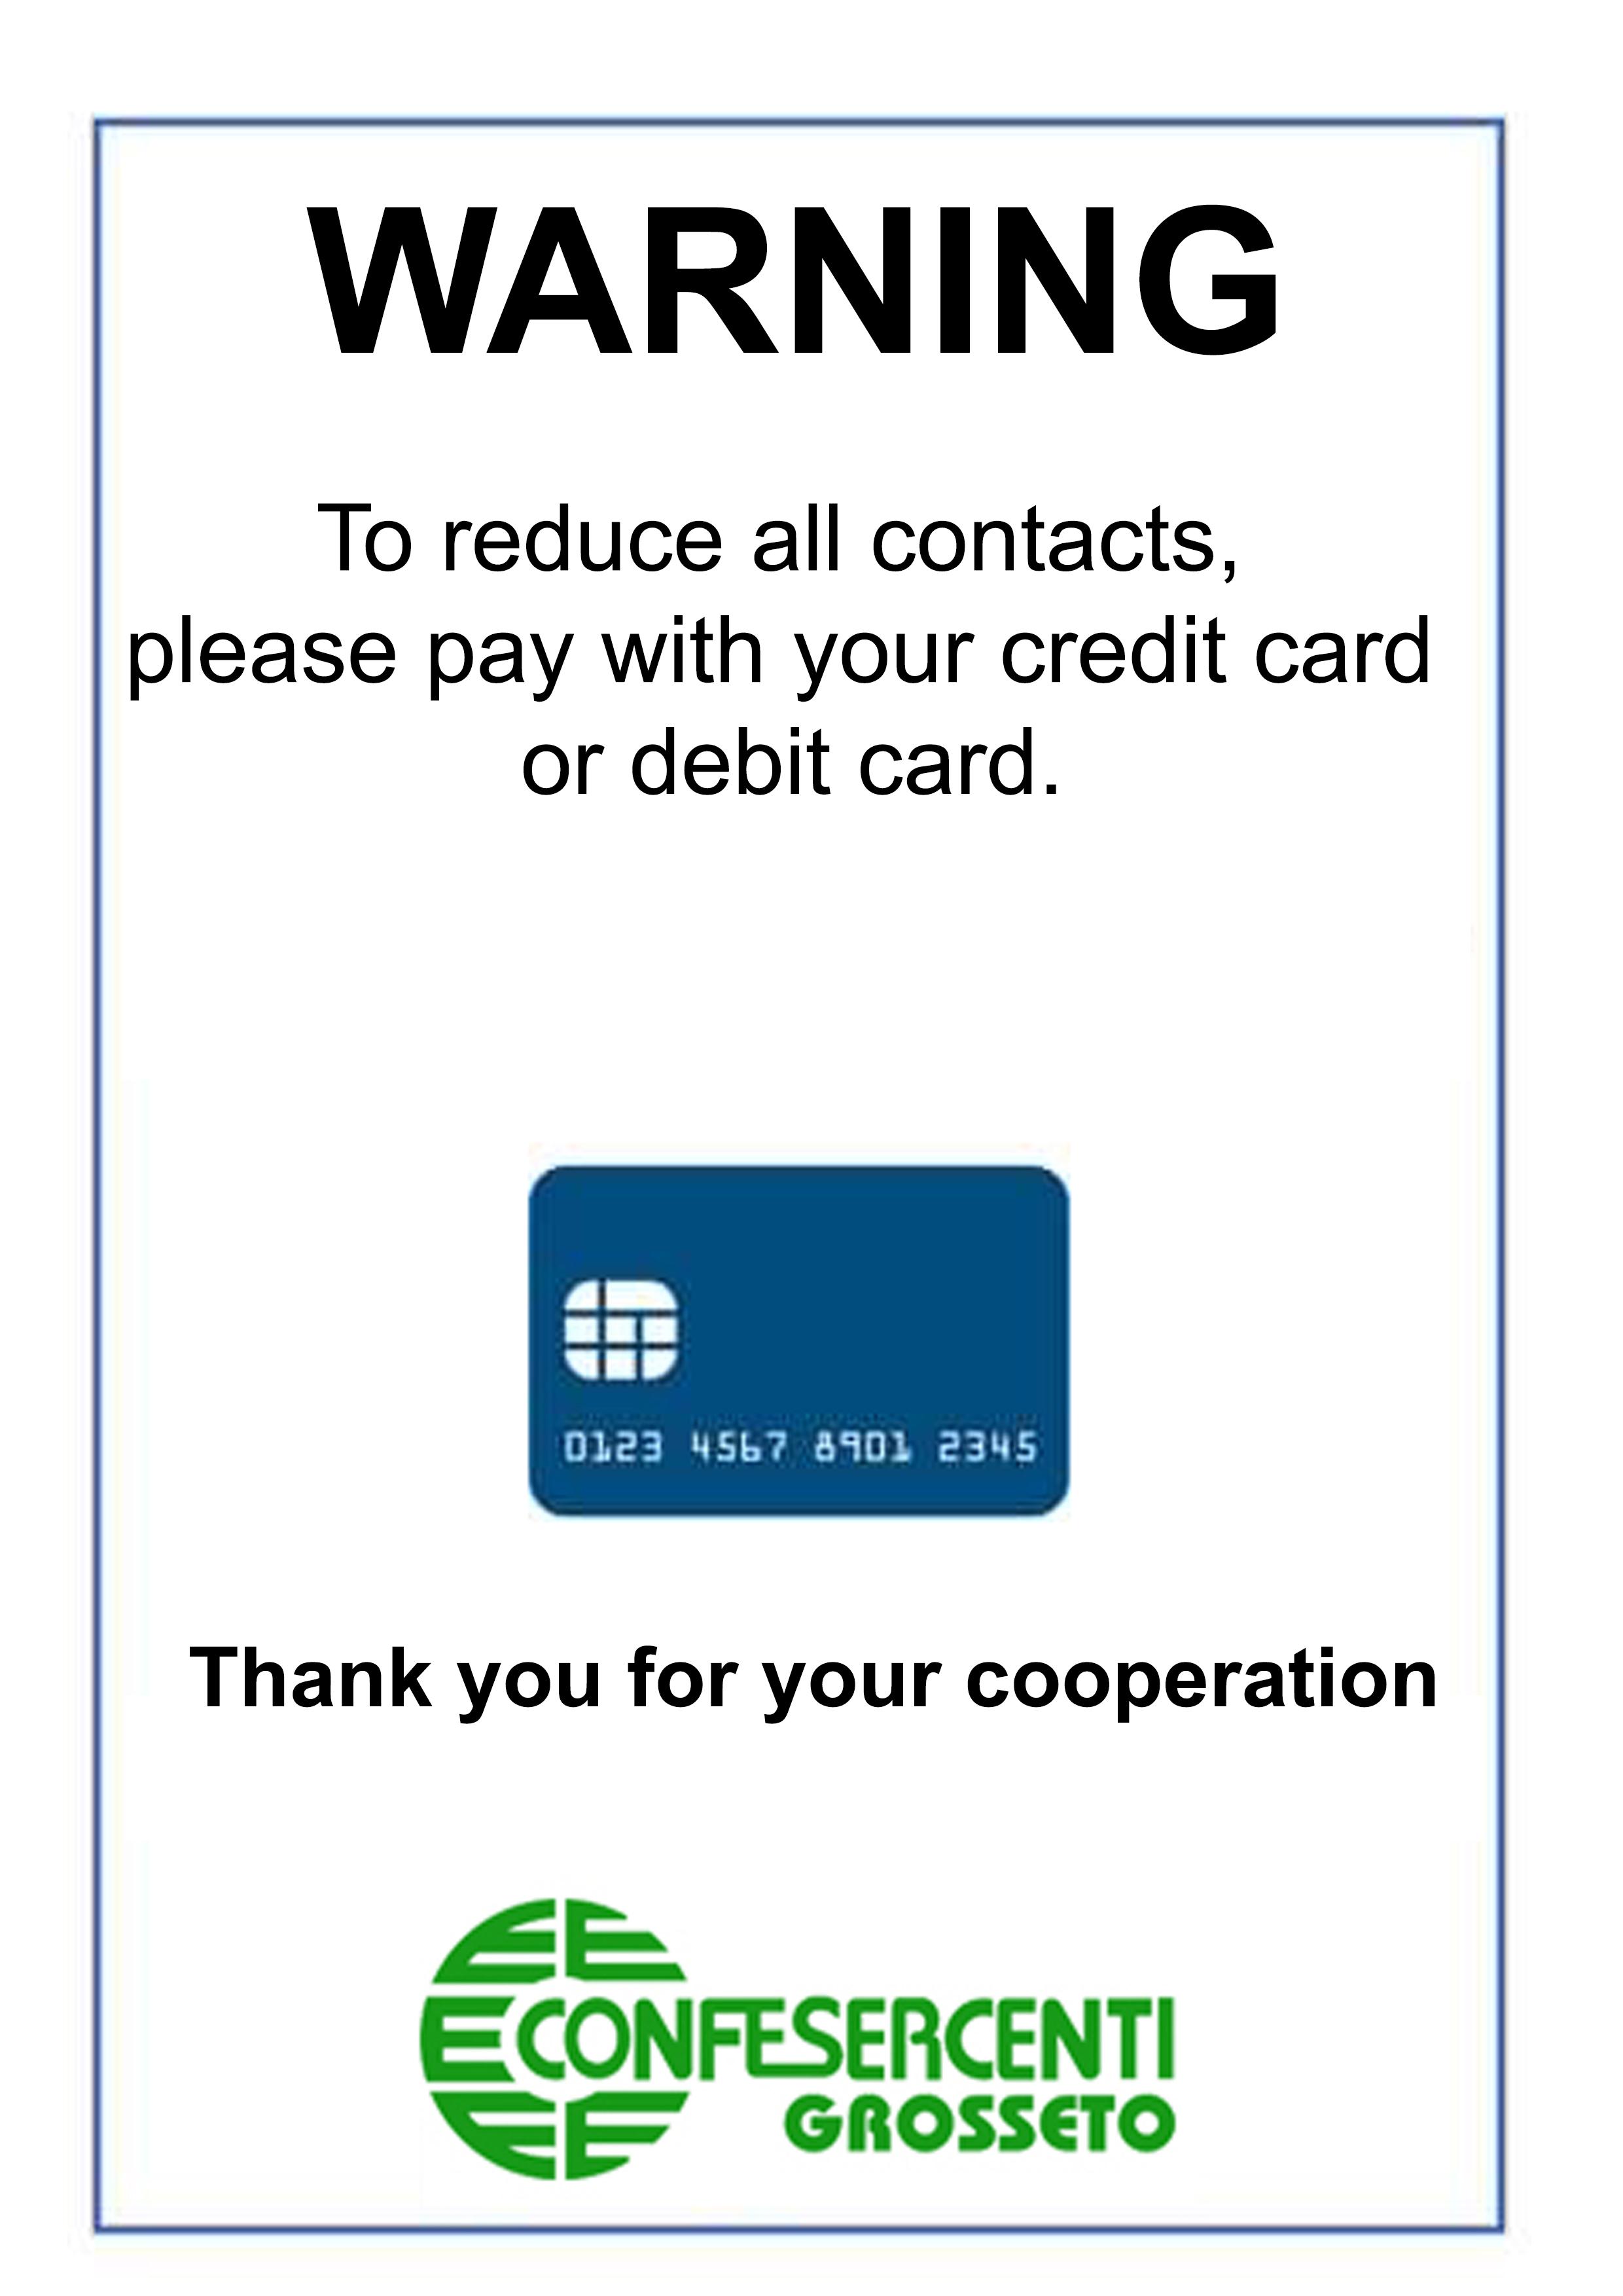 utilizzo-carta-credito-o-bancomat-n-5-a4-inglese